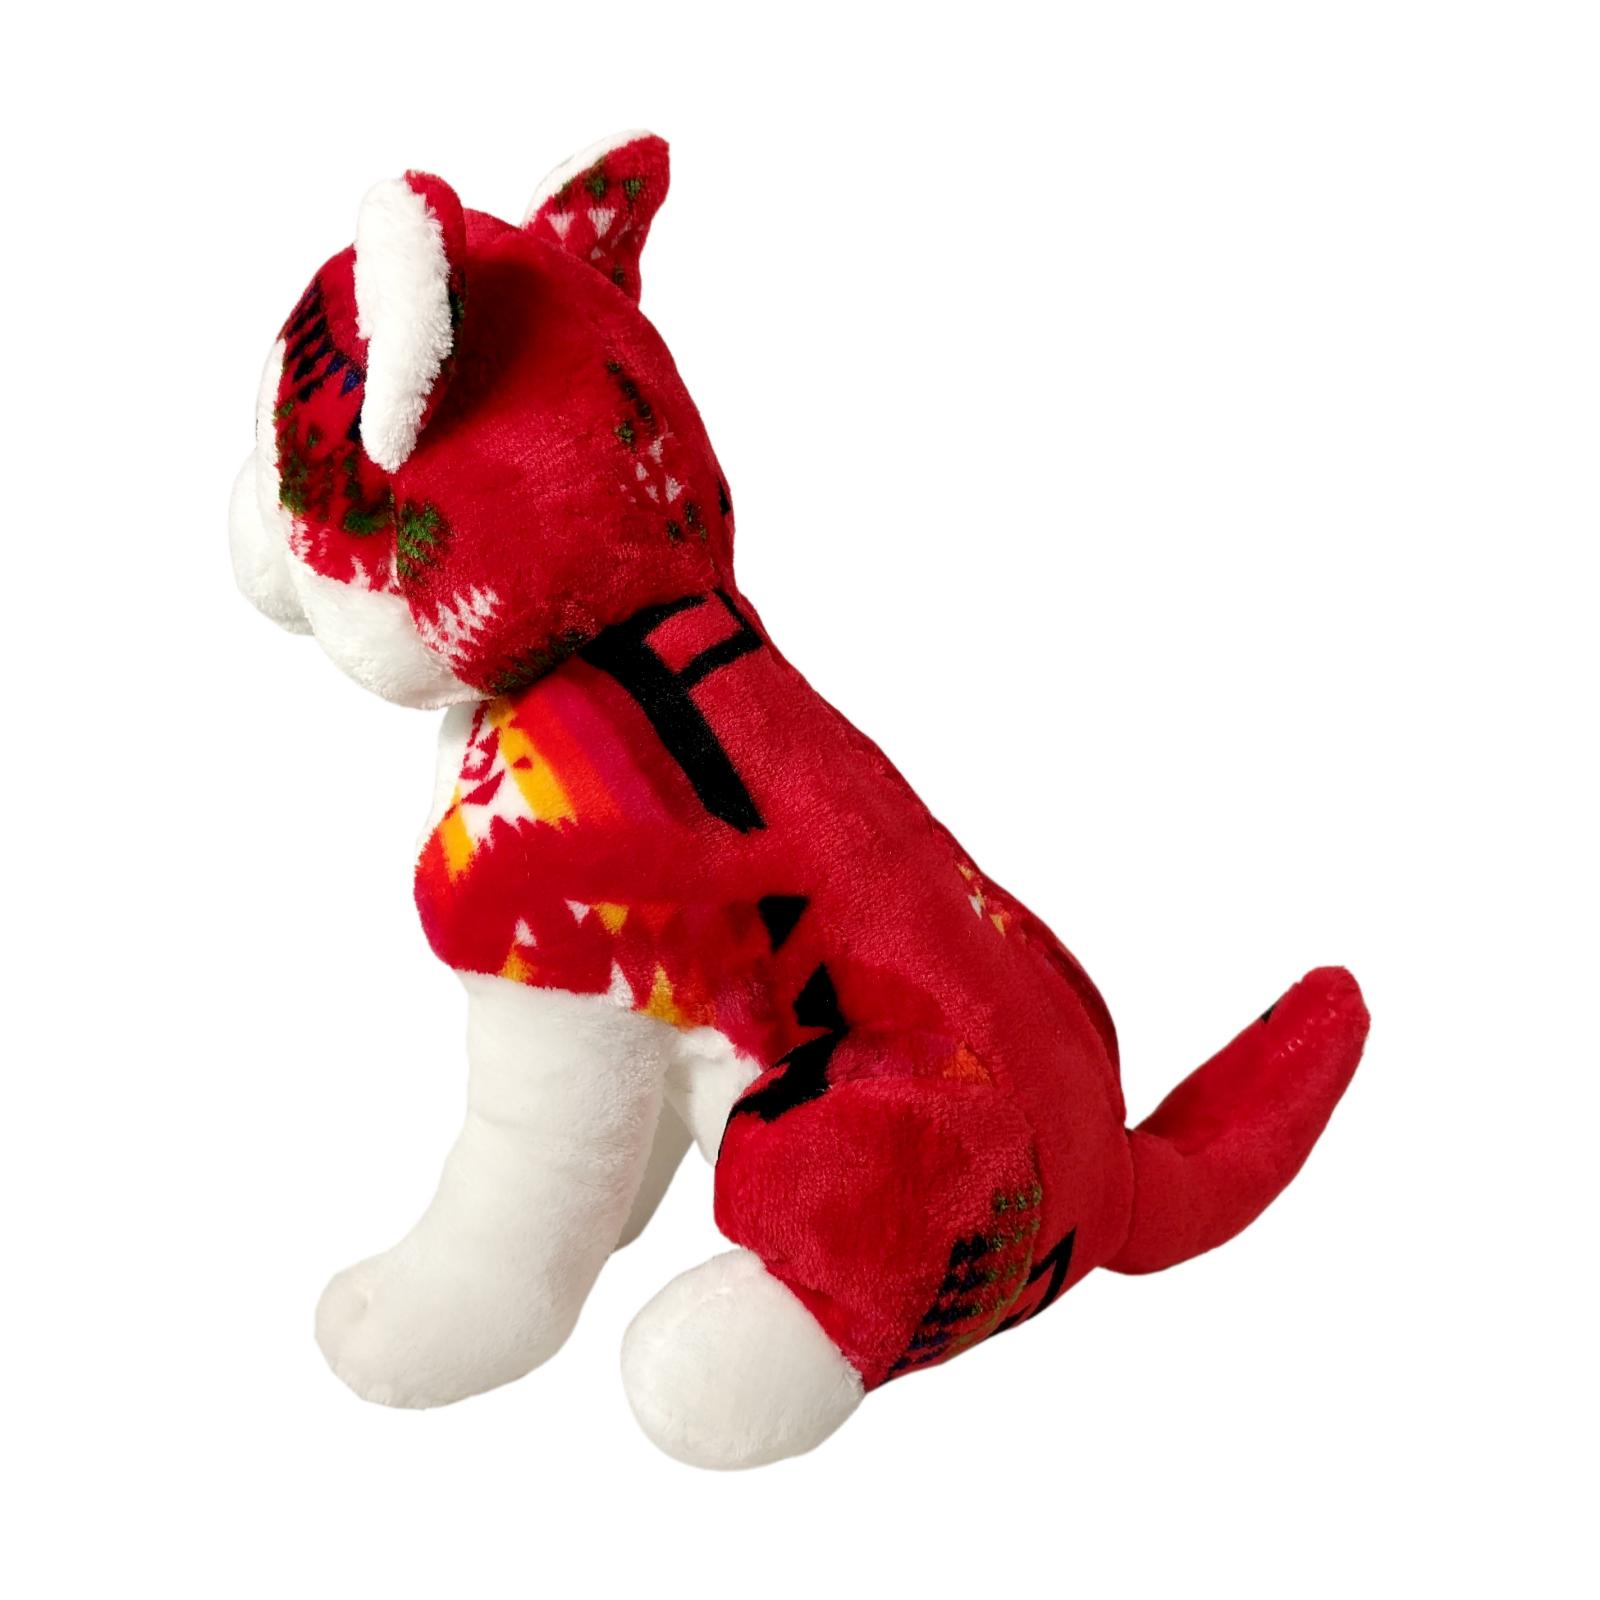 TychoTyke Stuffed Animal Husky Plush Toy Southwest - Red